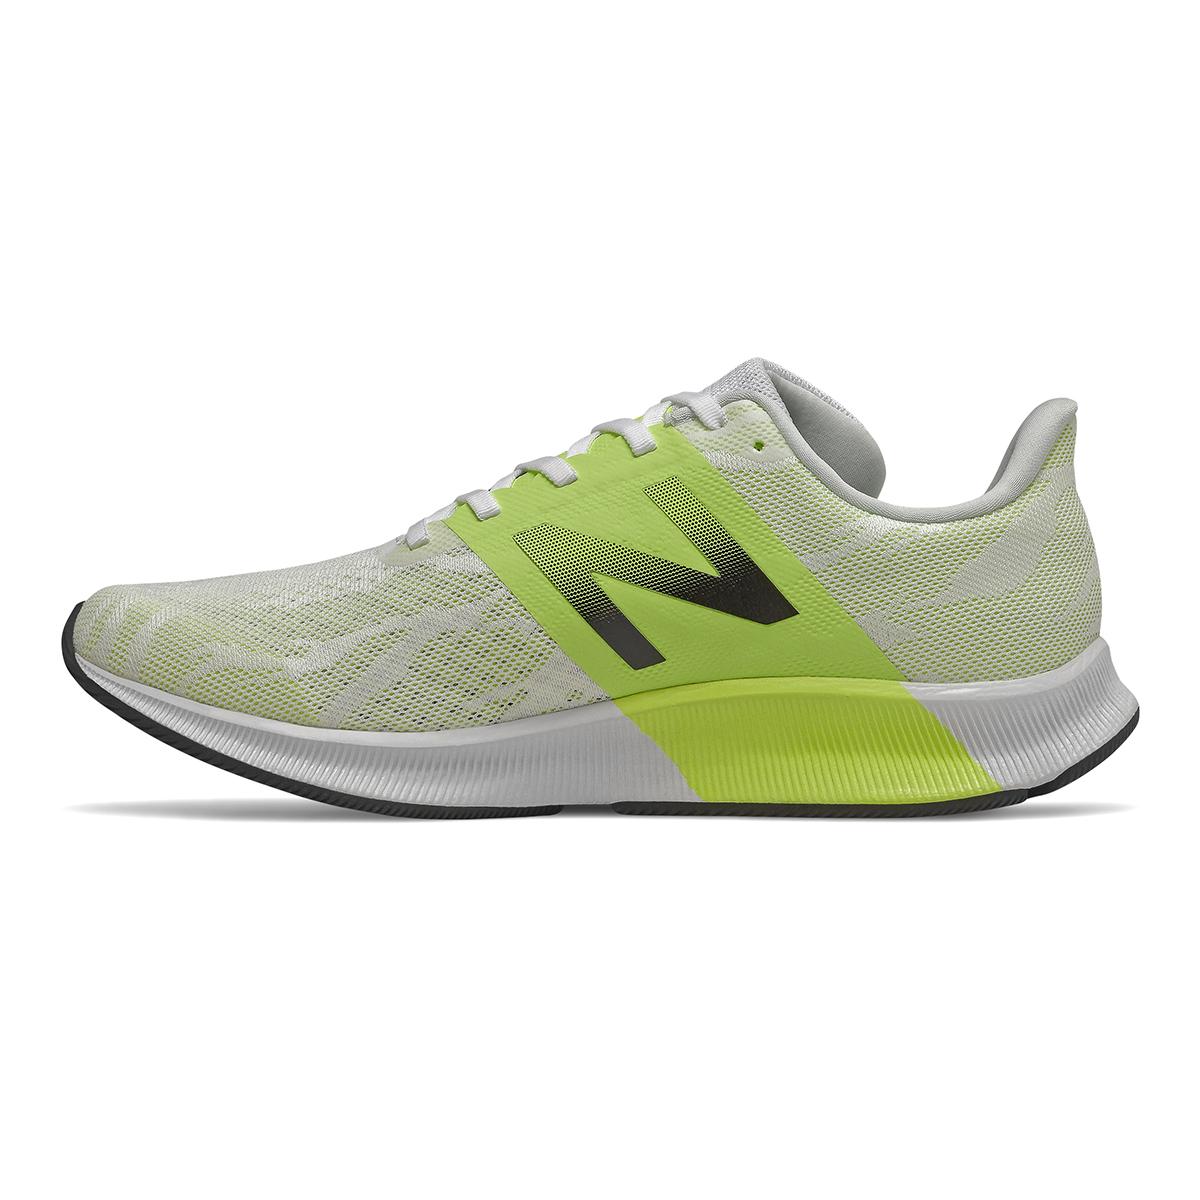 Men's New Balance 890V8 Running Shoe - Color: White (Wide Width) - Size: 7, White, large, image 2